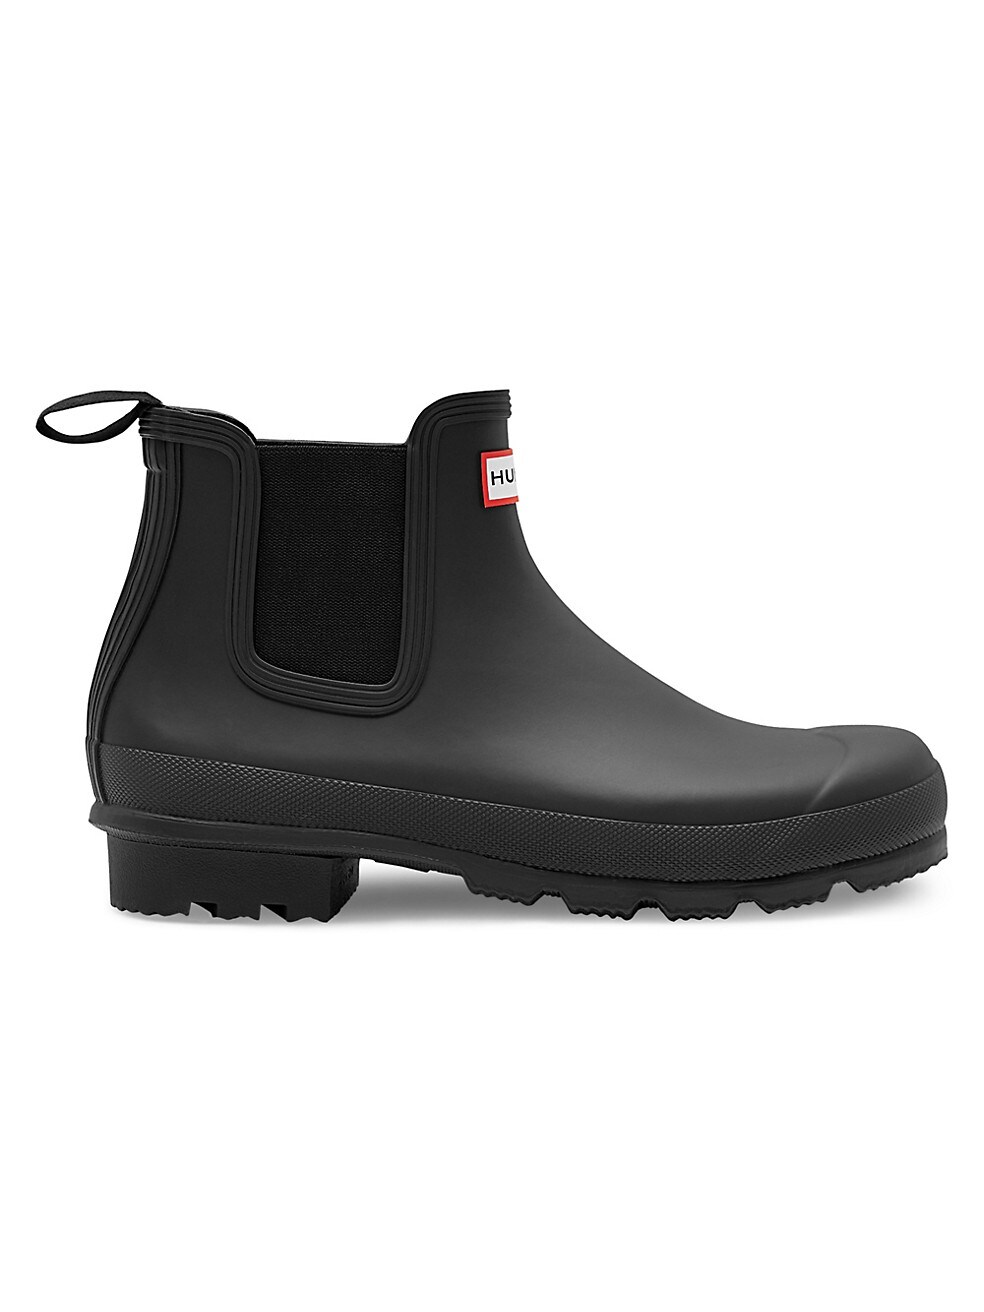 Hunter Waterproof Rubber Chelsea Boots